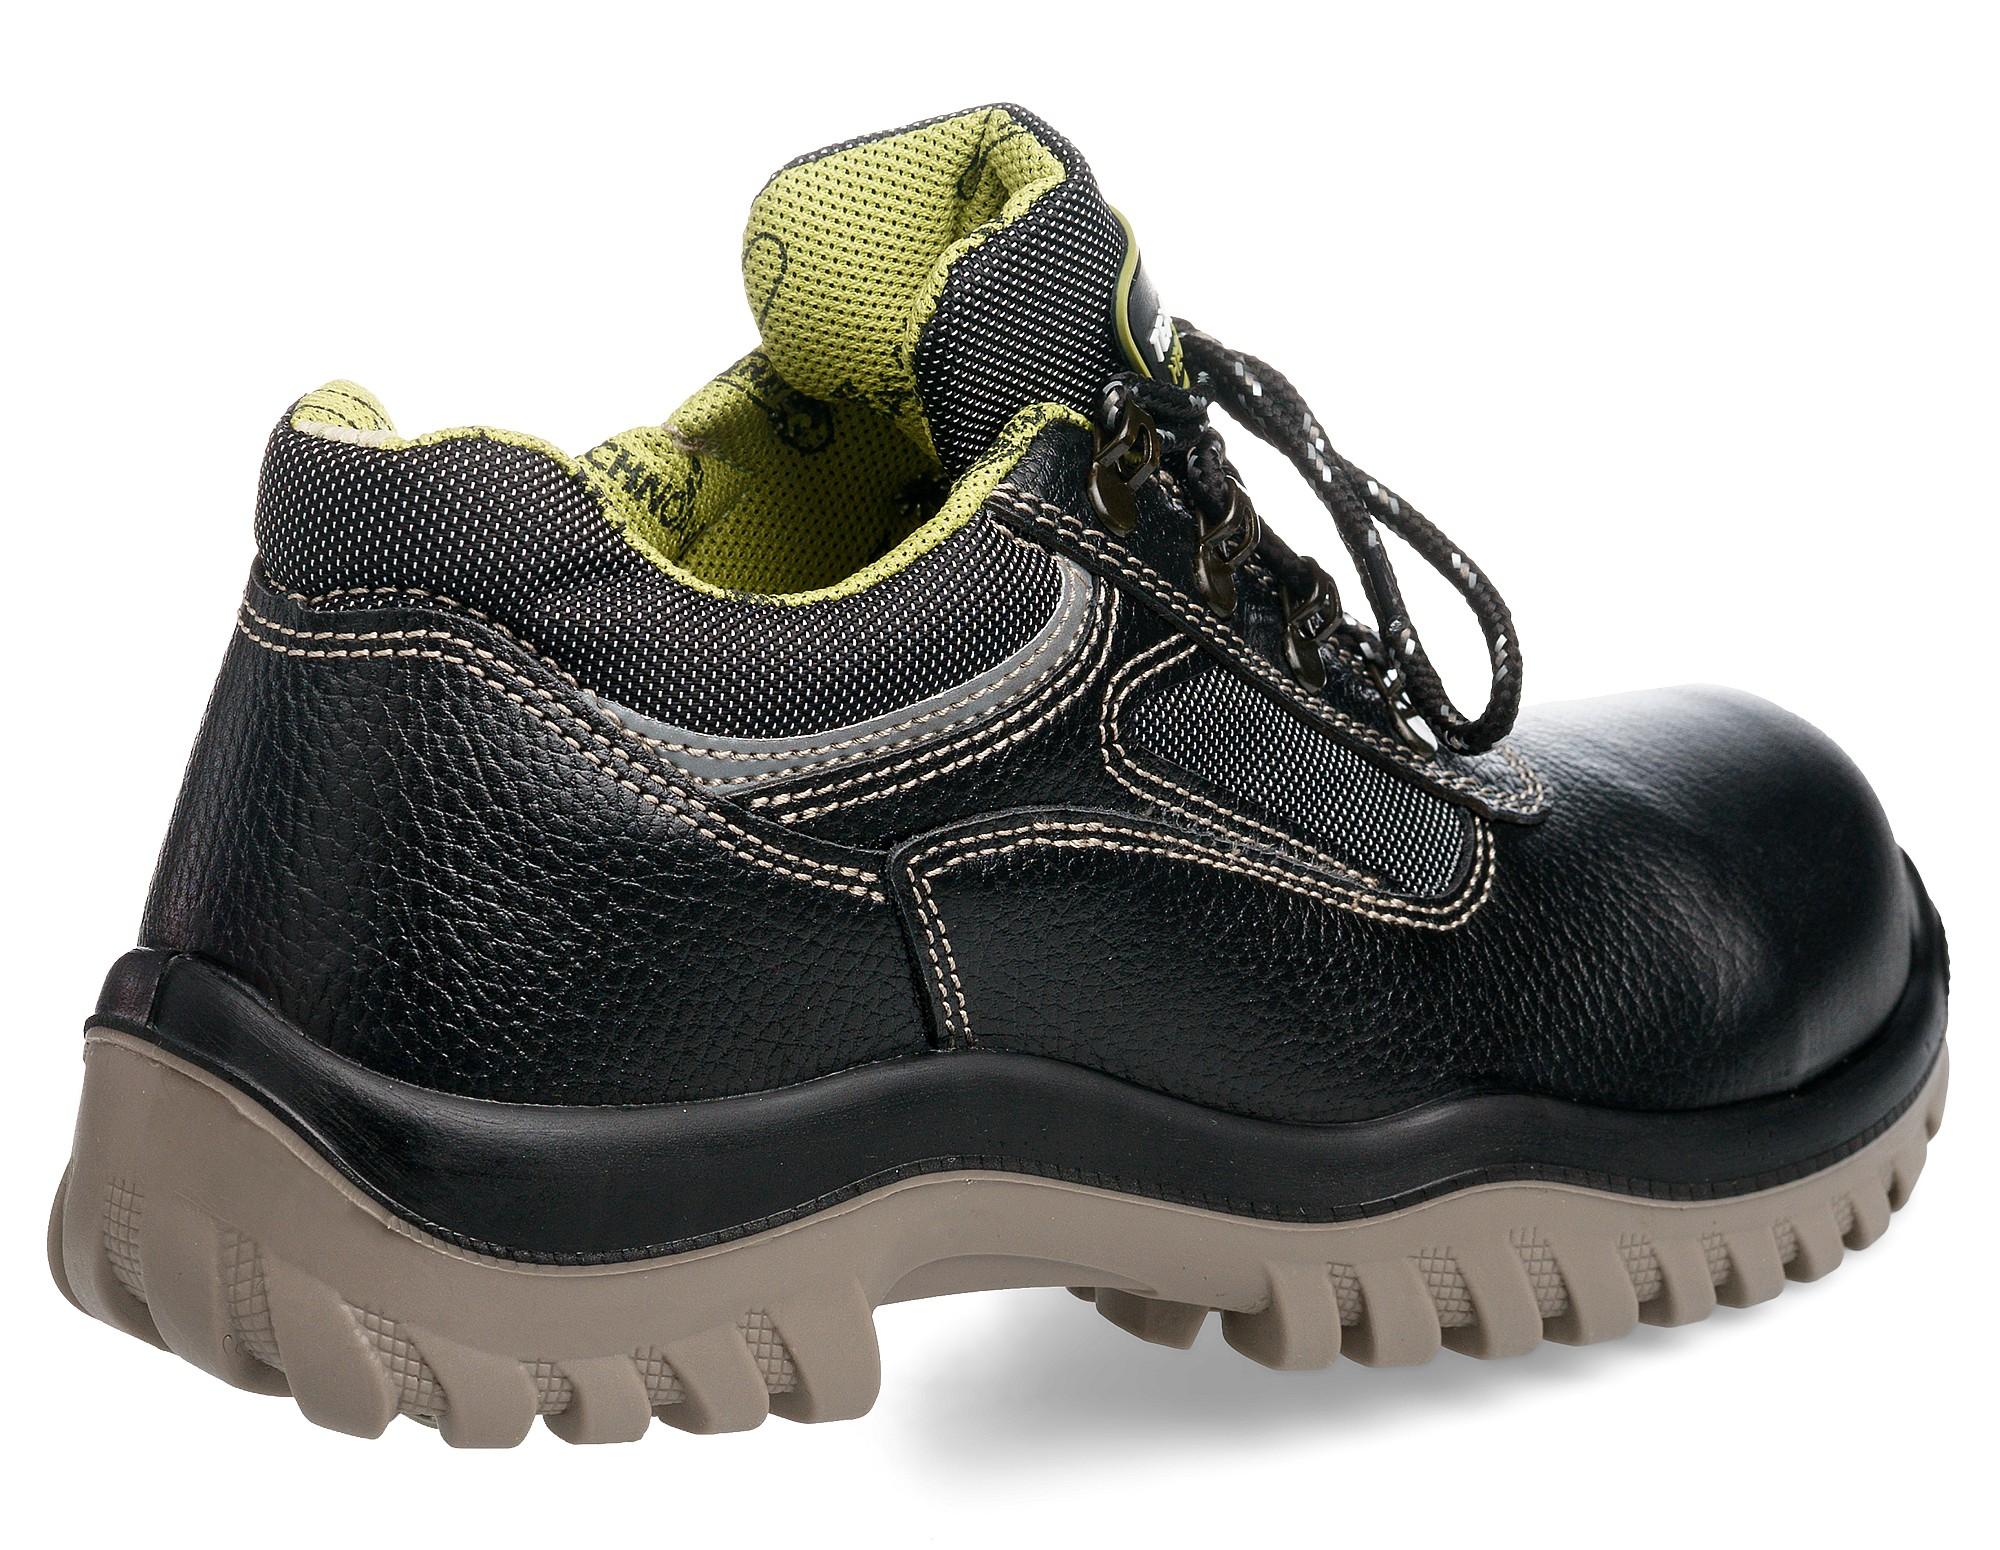 92cbb092a Полуботинки мужские кожаные Неогард-Лайт® :: Техноавиа